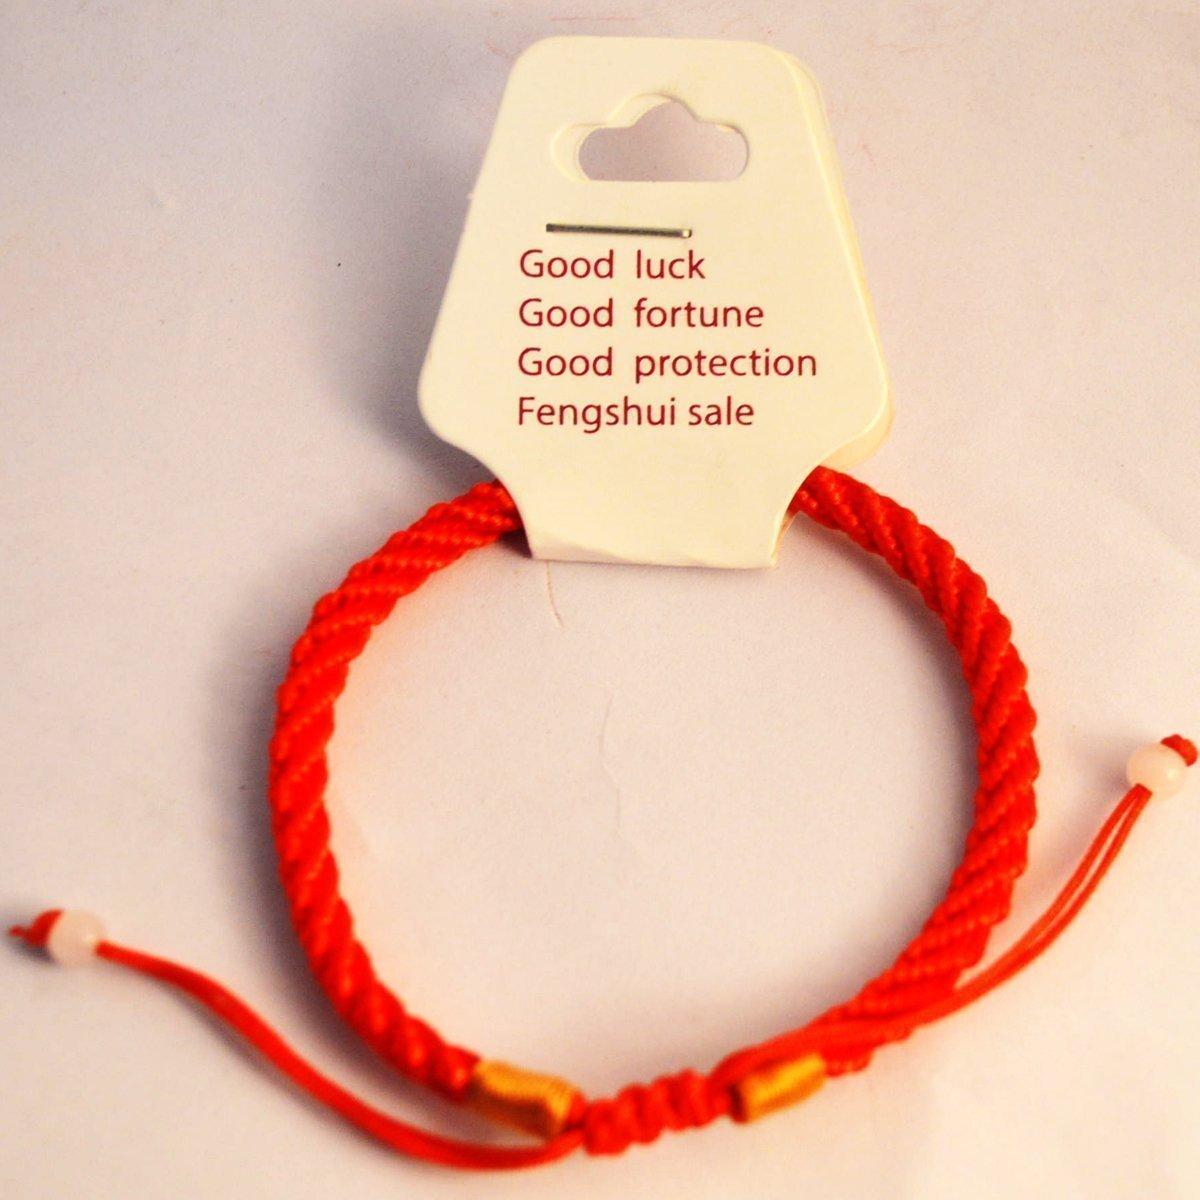 Gong de sobremesa Zen Feng Shui lat/ón dise/ño de Fortune W incluye Mxsabrina rojo Pulsera cuerdas H1301